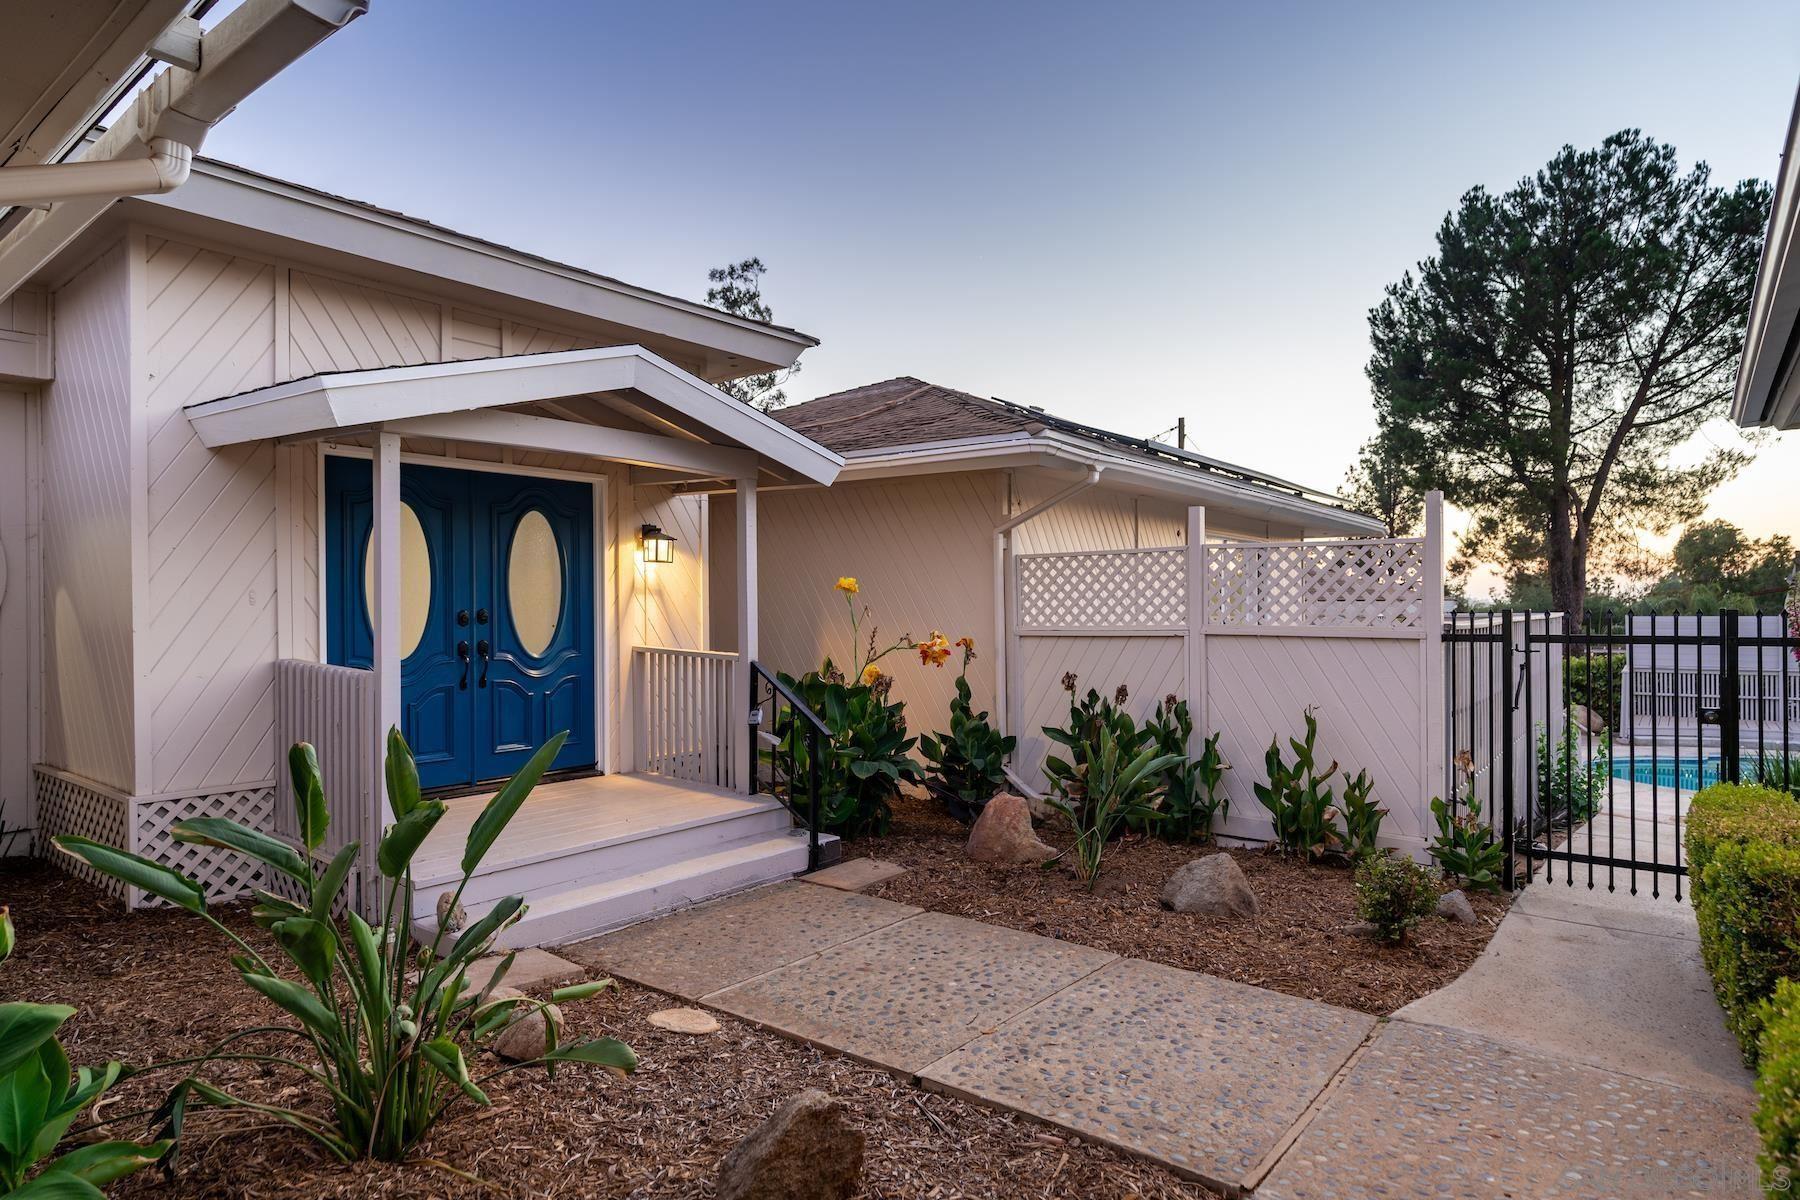 Photo of 2420 Dehesa Rd, El Cajon, CA 92019 (MLS # 210026488)